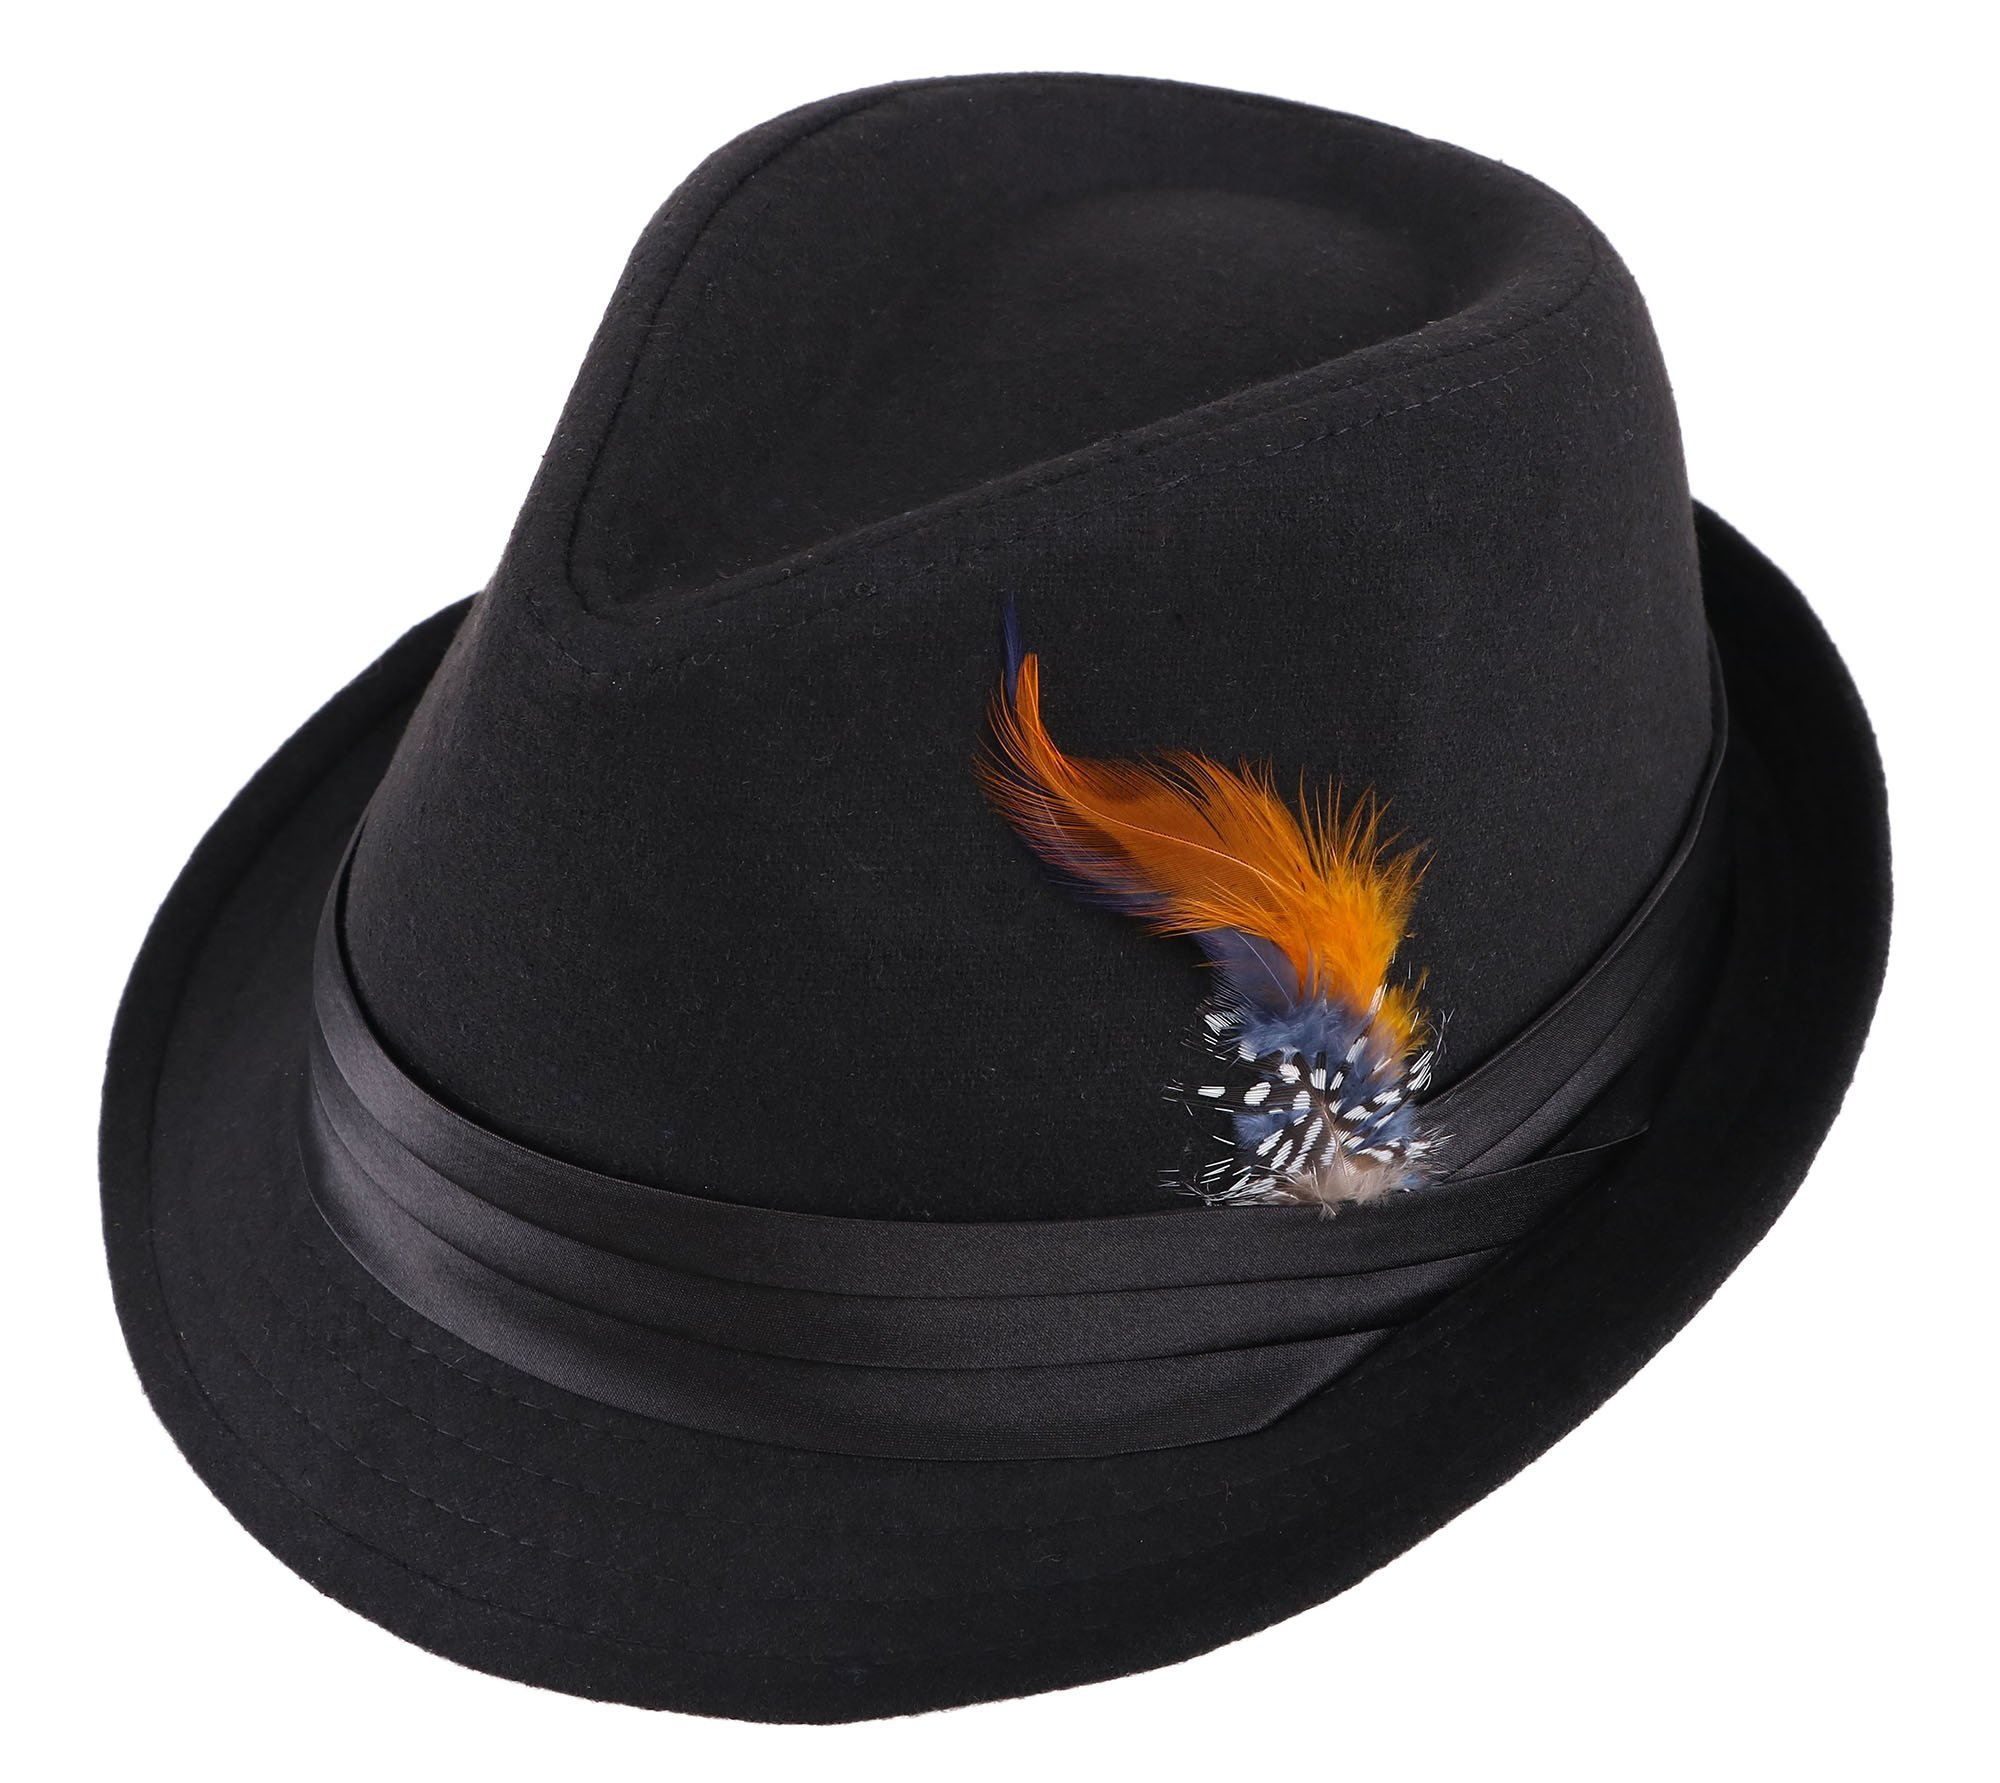 Denovit Mens & Women's Classic Sleek Dapper Fedora Hat,Black/Orange Fur